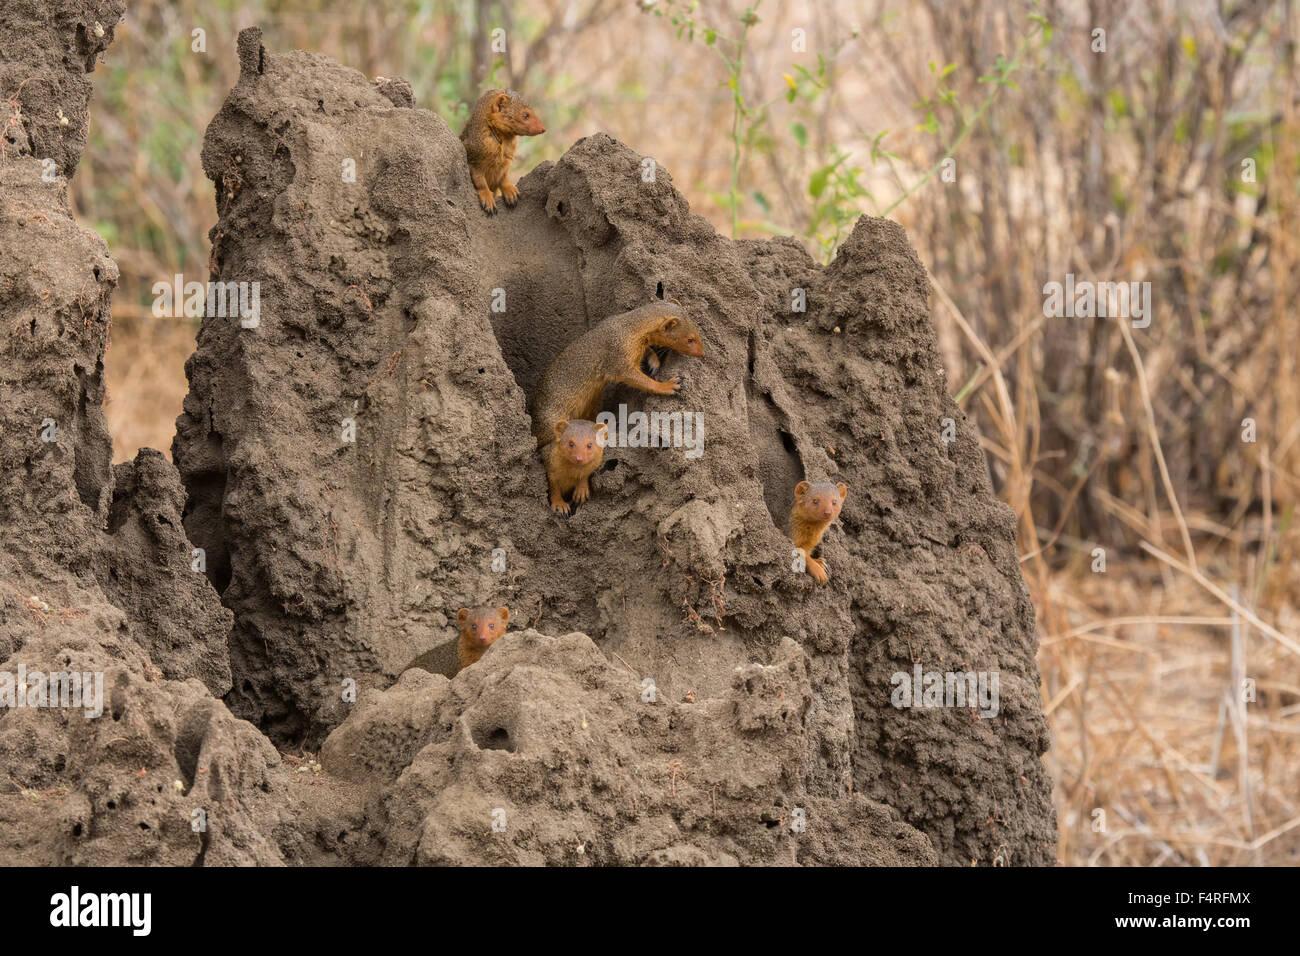 Africa, Lake Manyara, national park, mangosteen, safari, travel, mammals, Tanzania, animals, wilderness, wild animals - Stock Image